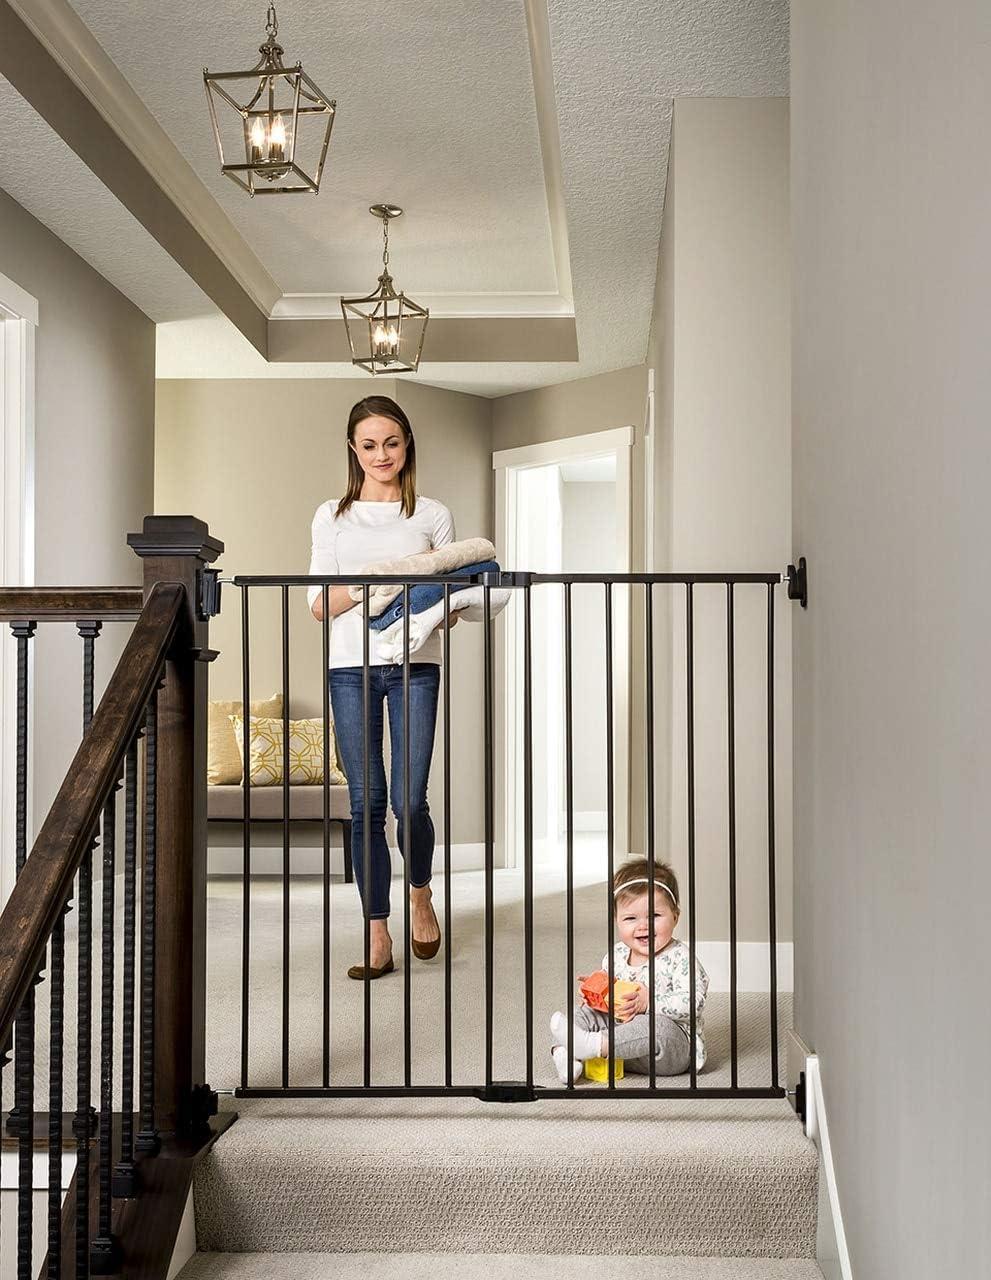 Protector Premium para ni/ños TRITINA Corner y Guardabarros 13ft Edge Cushion + 8 Corner Cushion Gris 4.3m Home Safety 1st Mamami 14ft Seguridad infantil